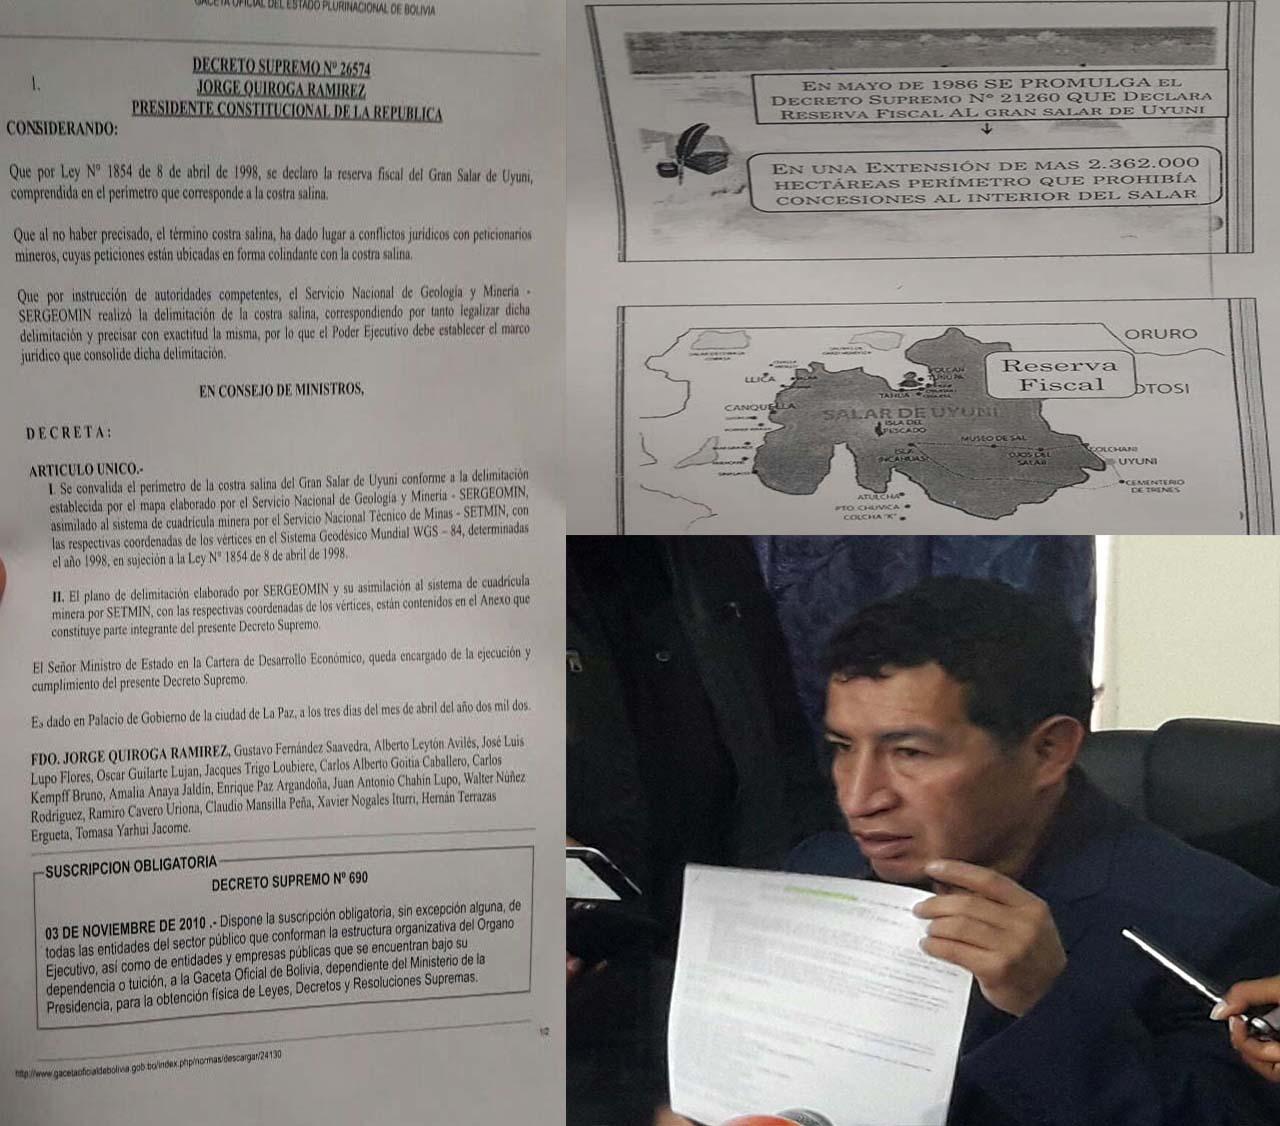 Diputado del MAS iniciará un juicio de responsabilidades contra Tuto Quiroga